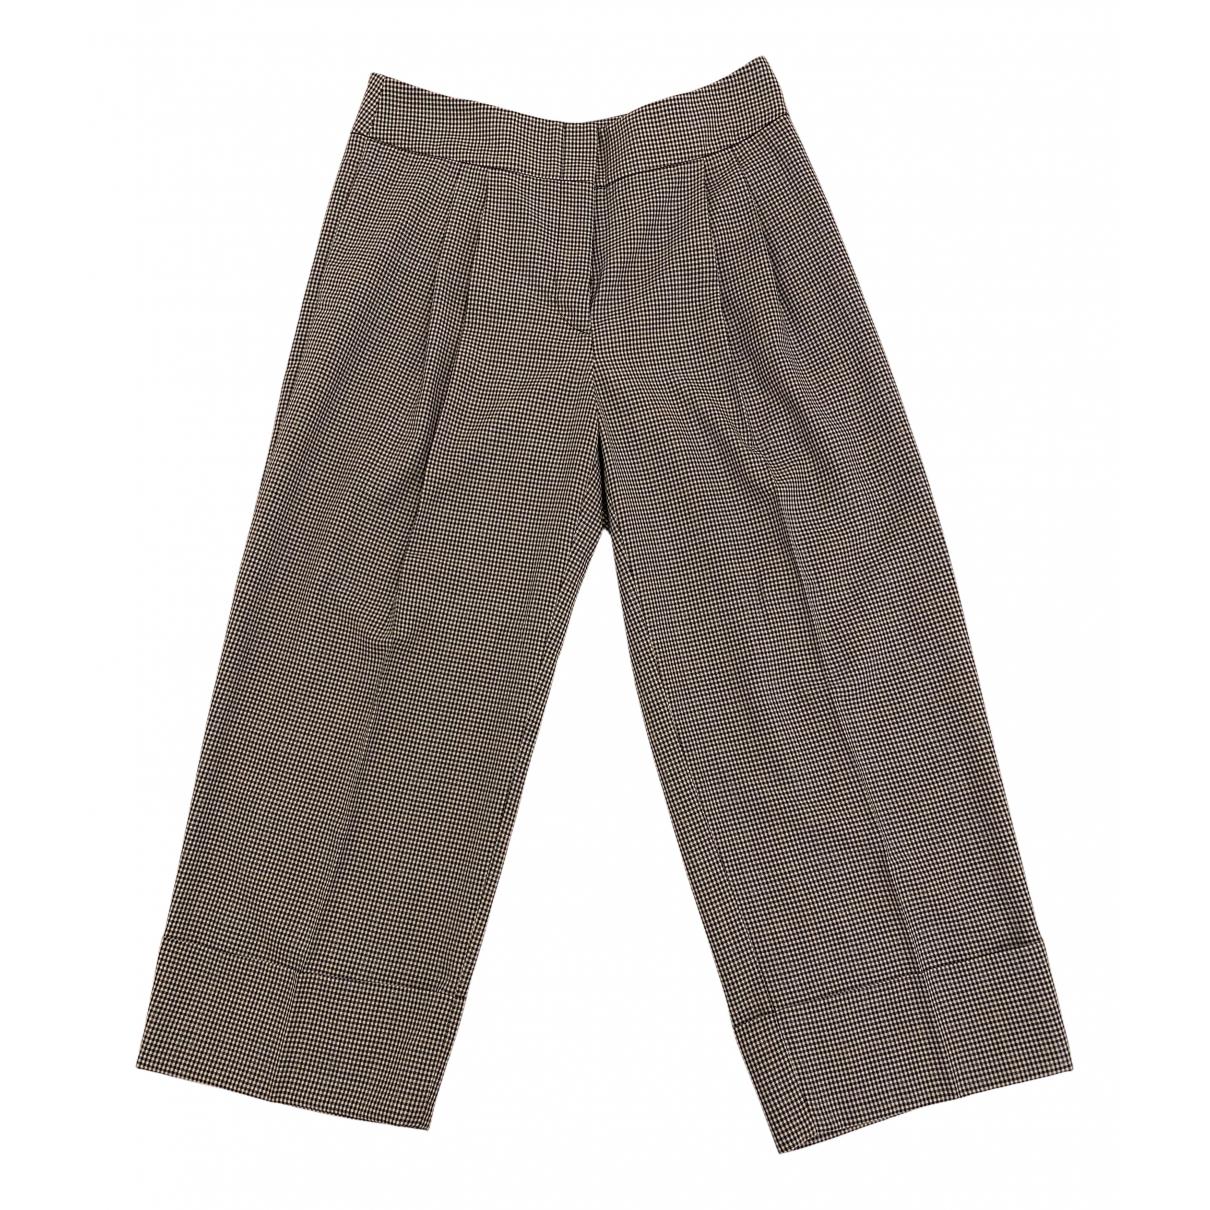 Antonio Marras N Cotton Trousers for Women 40 IT